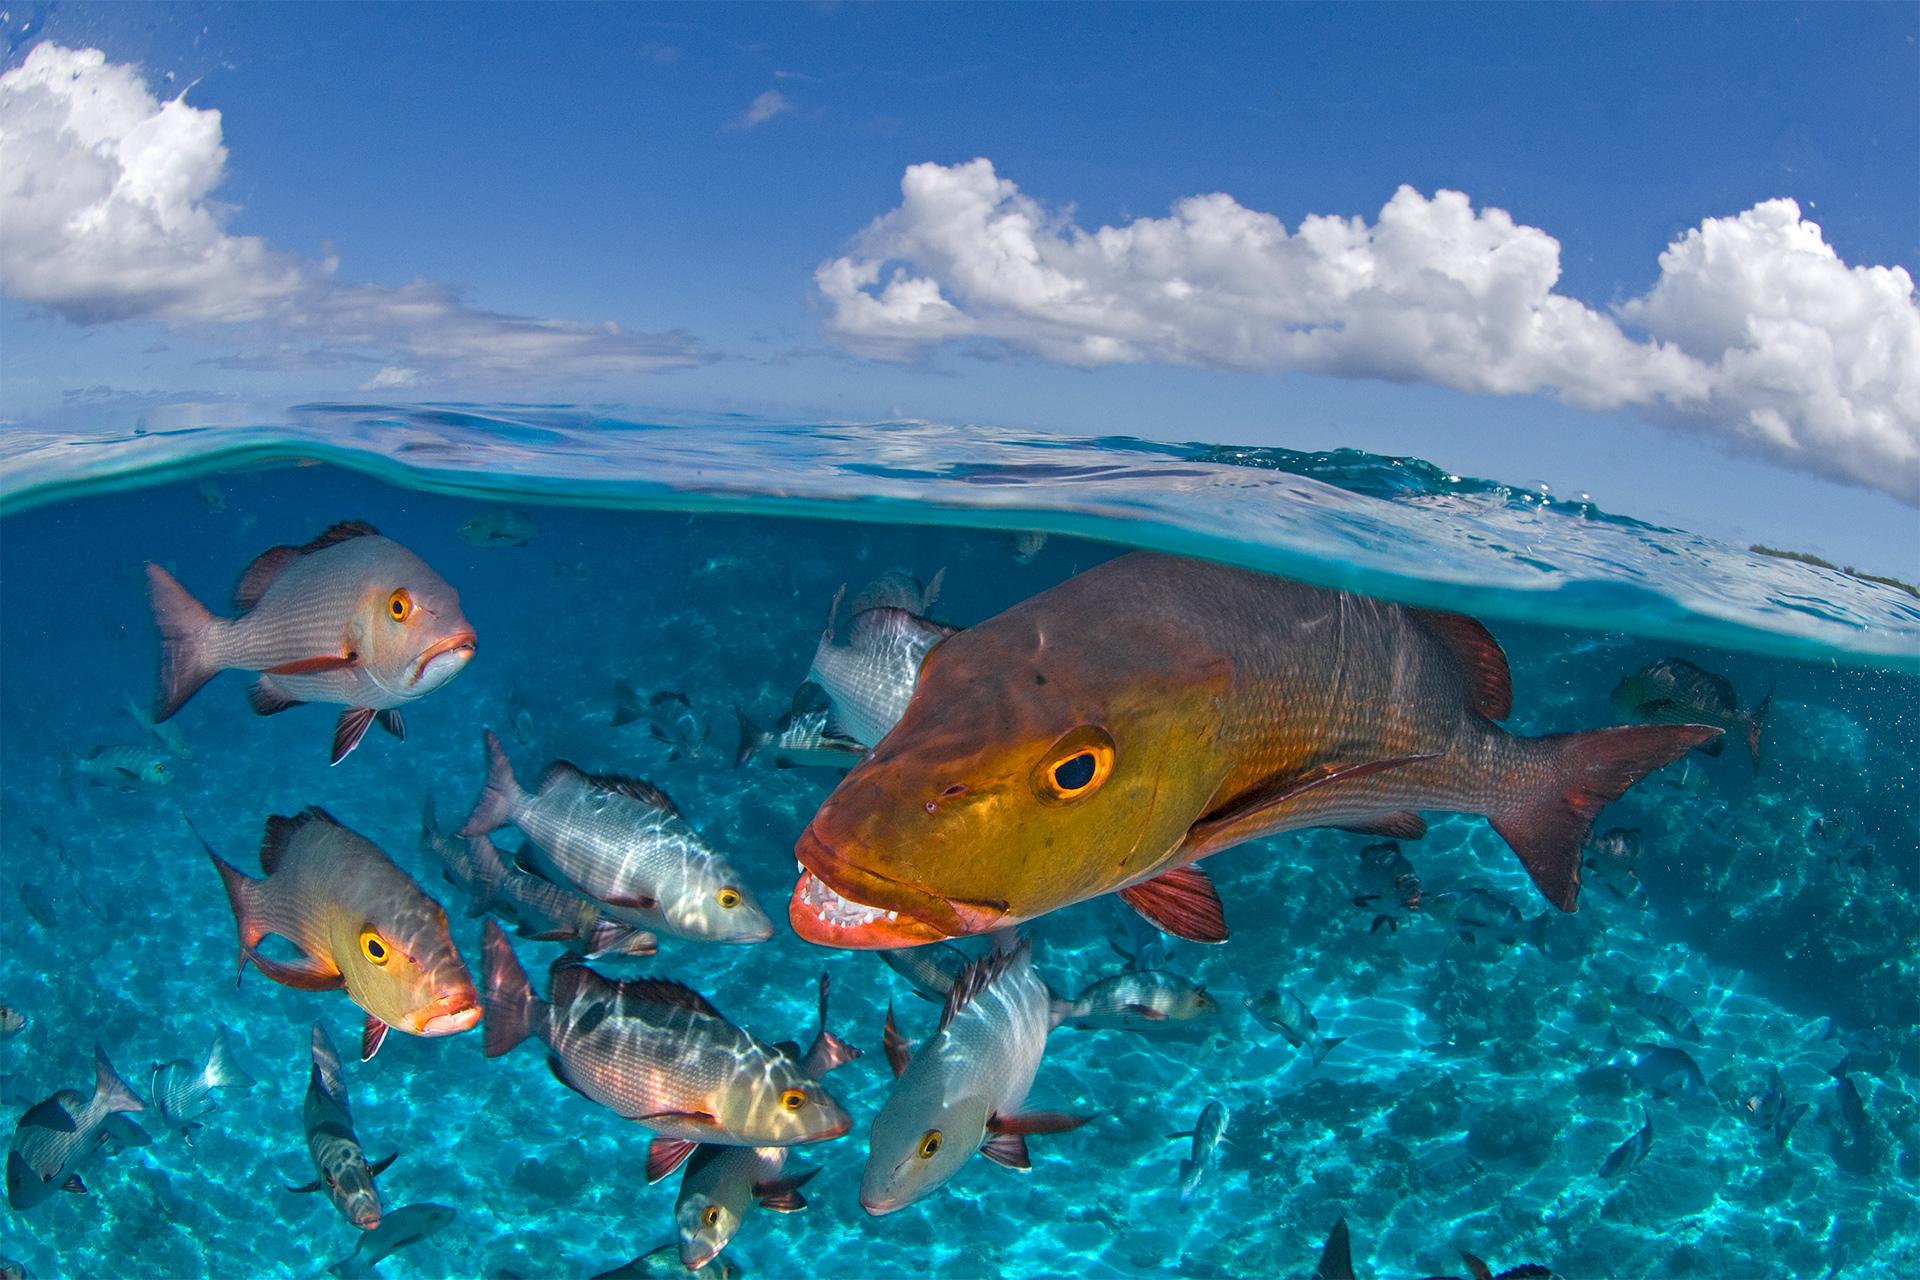 The Washington Center Peschak orange fish with smaller ones Award Winner